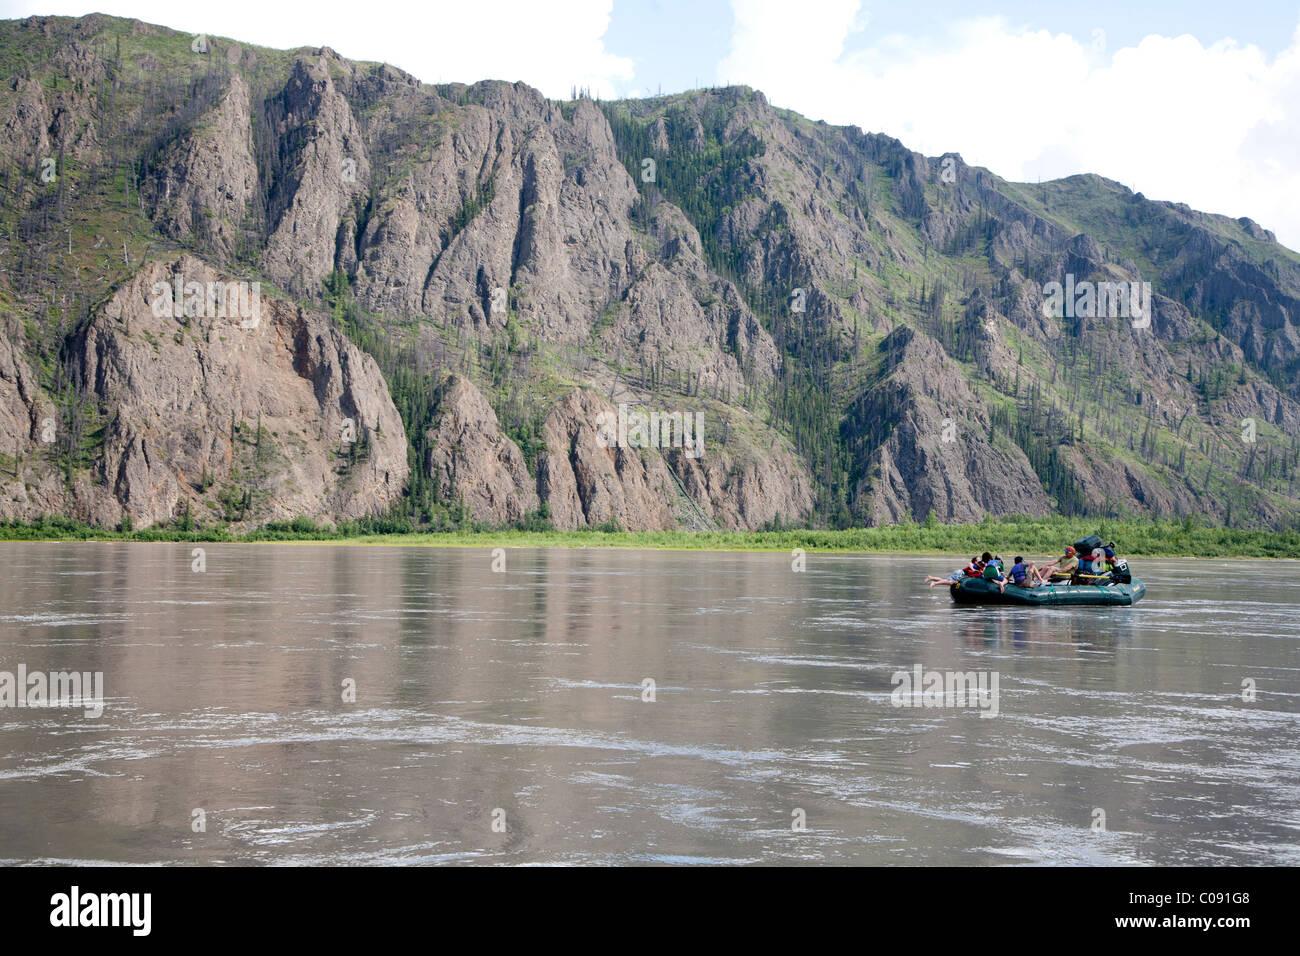 A Family floats down Yukon River in Yukon-Charley Rivers National Preserve  Interior Alaska, Summer - Stock Image